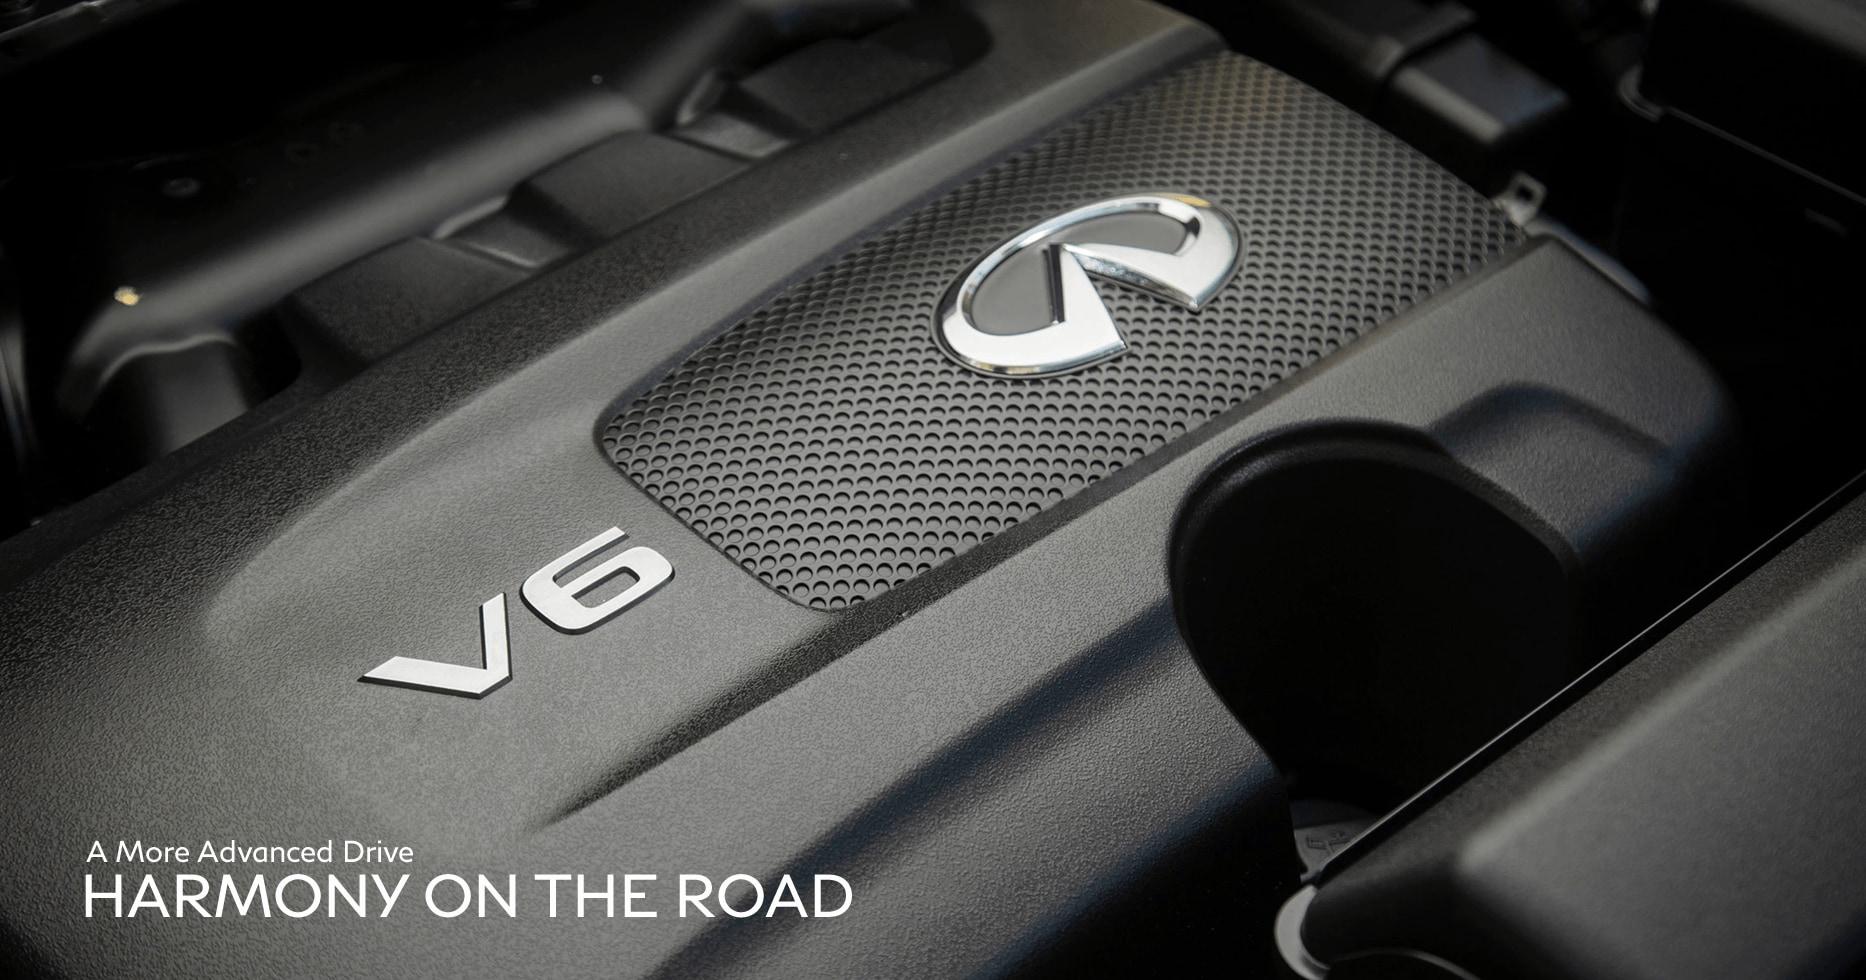 A More Advanced Drive